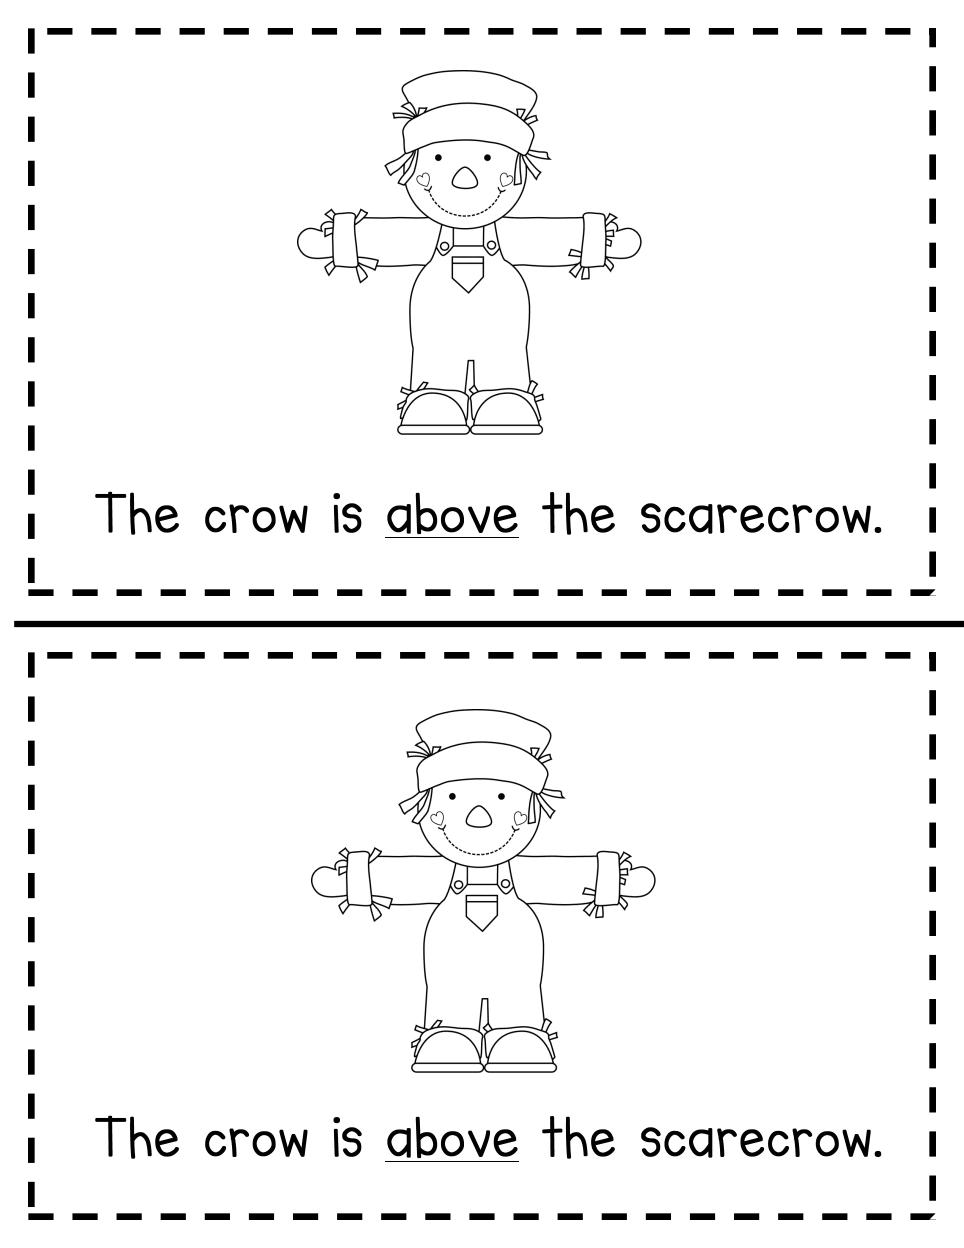 Worksheets Positional Words Worksheets For Kindergarten fall positional word book pdf scarecrow crafts pinterest pdf